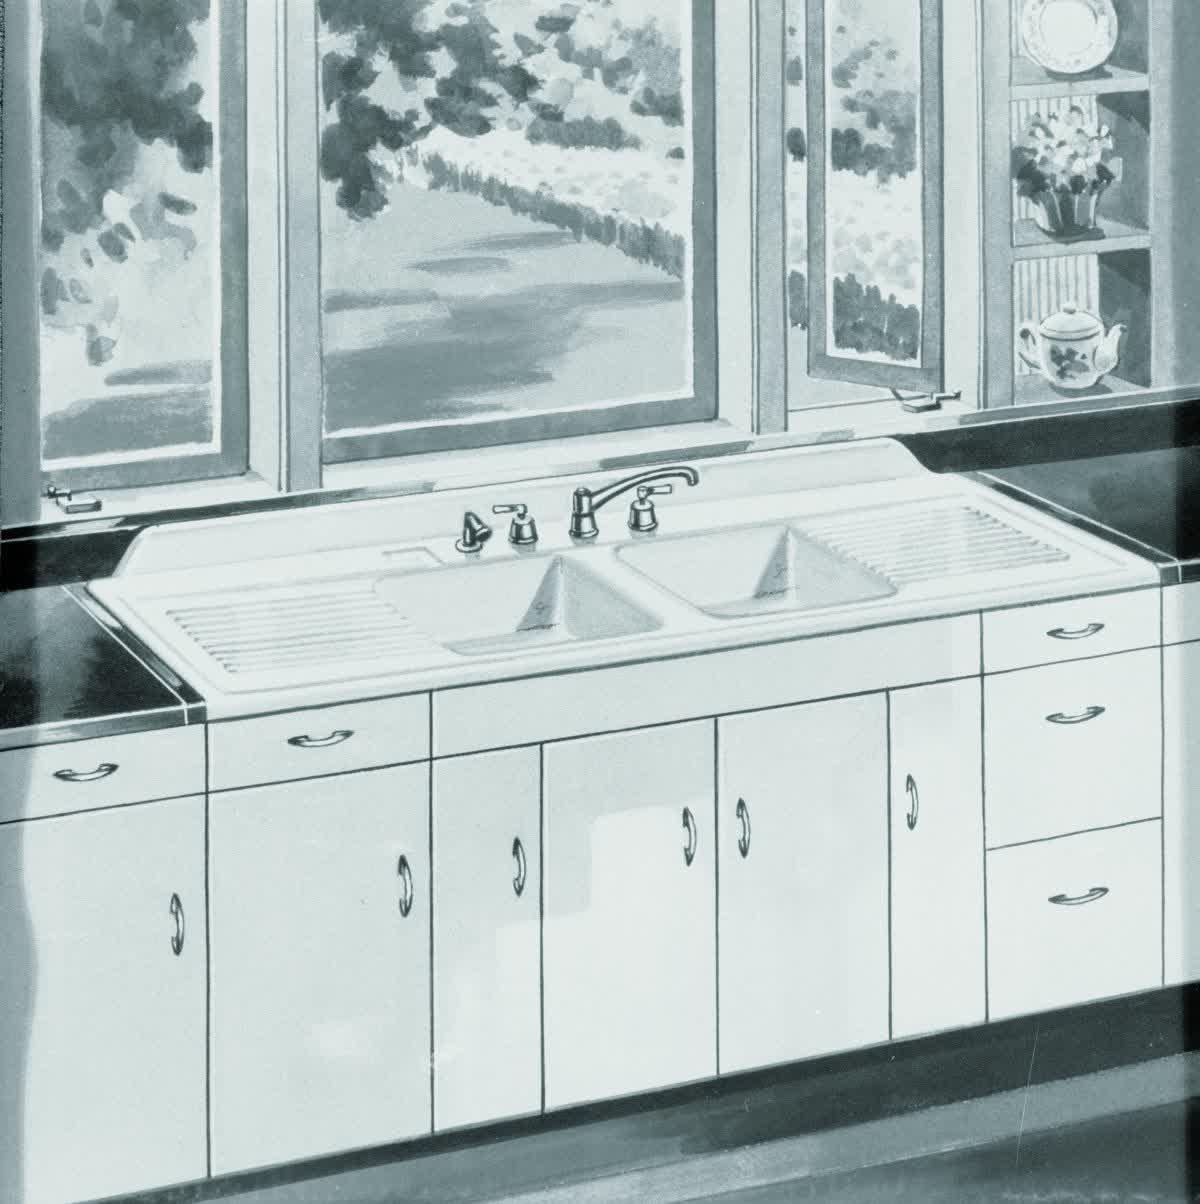 Installing Antique Iron Kitchen Sink with Drainboard - Home Design ...